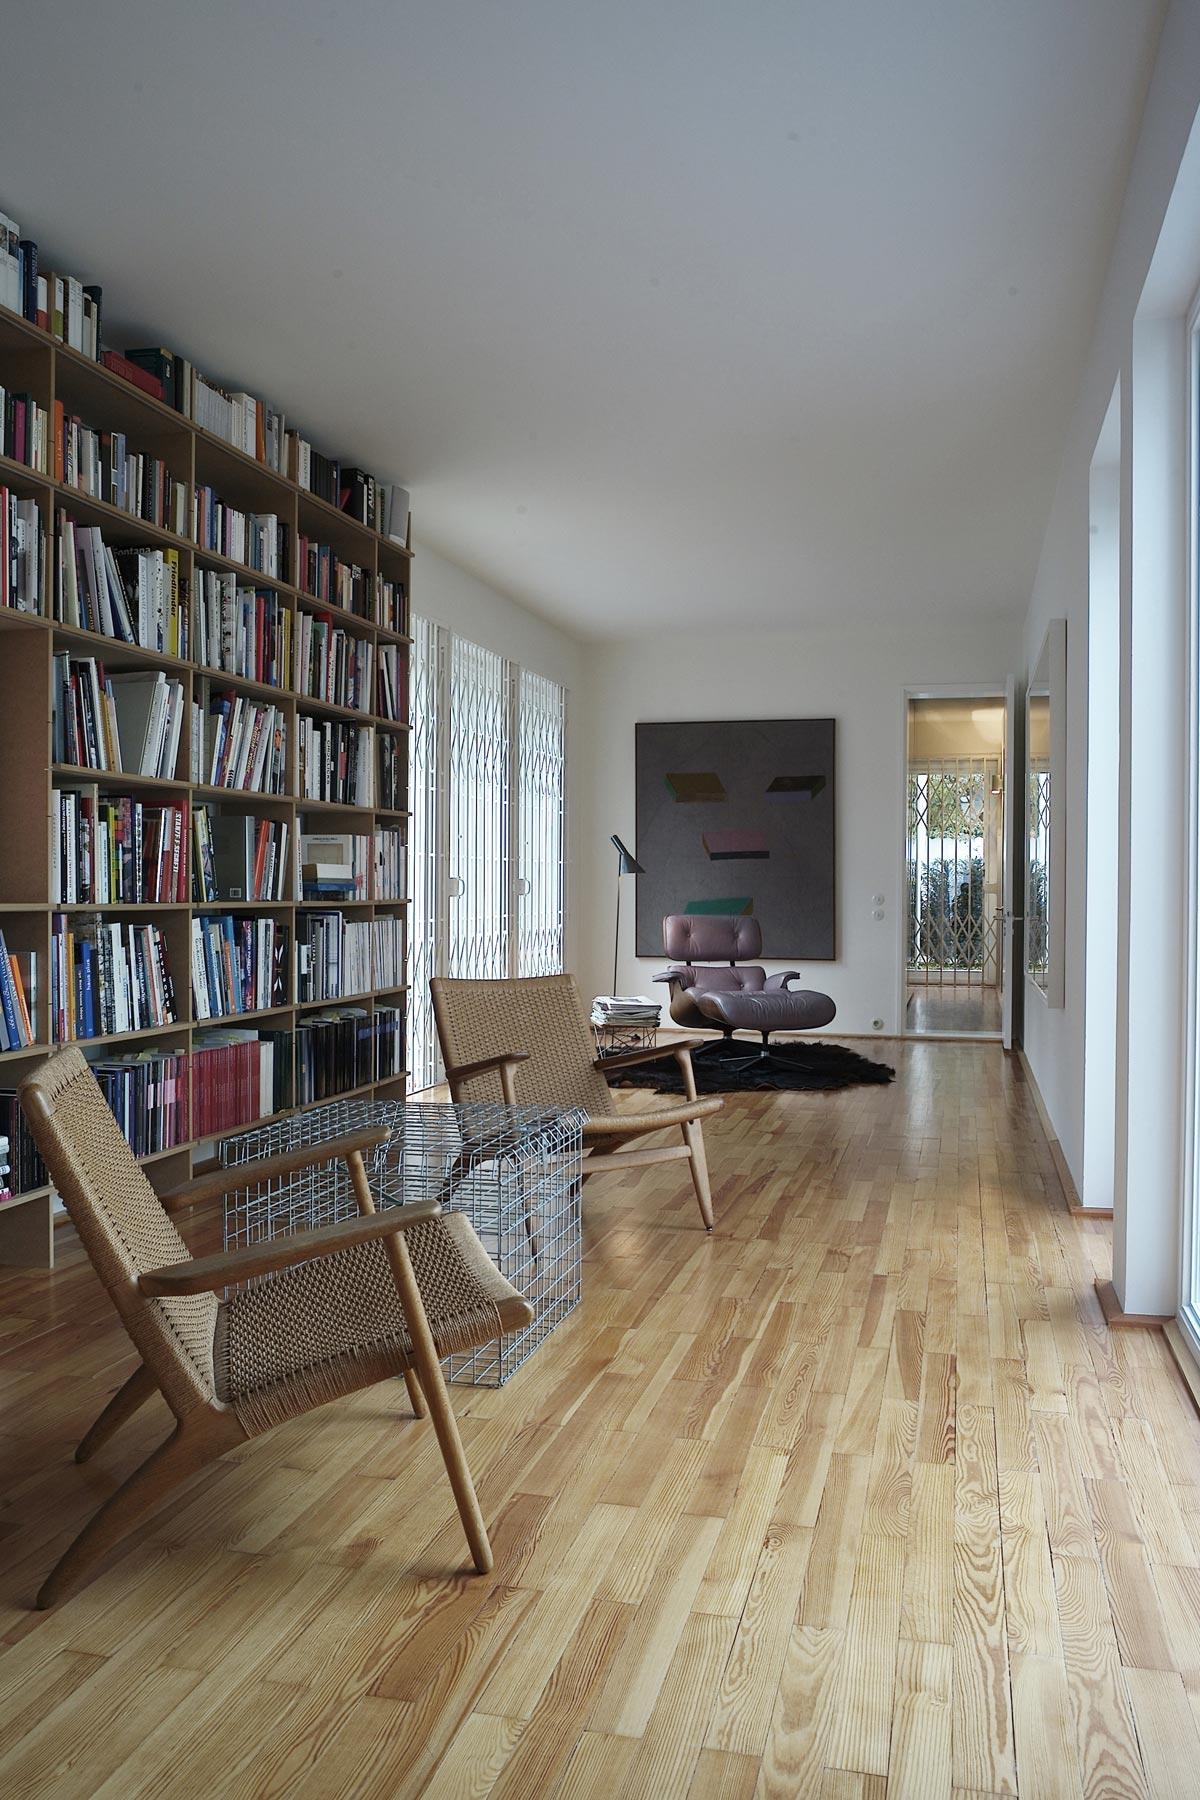 House Hornemann, Dusseldorf, Germany